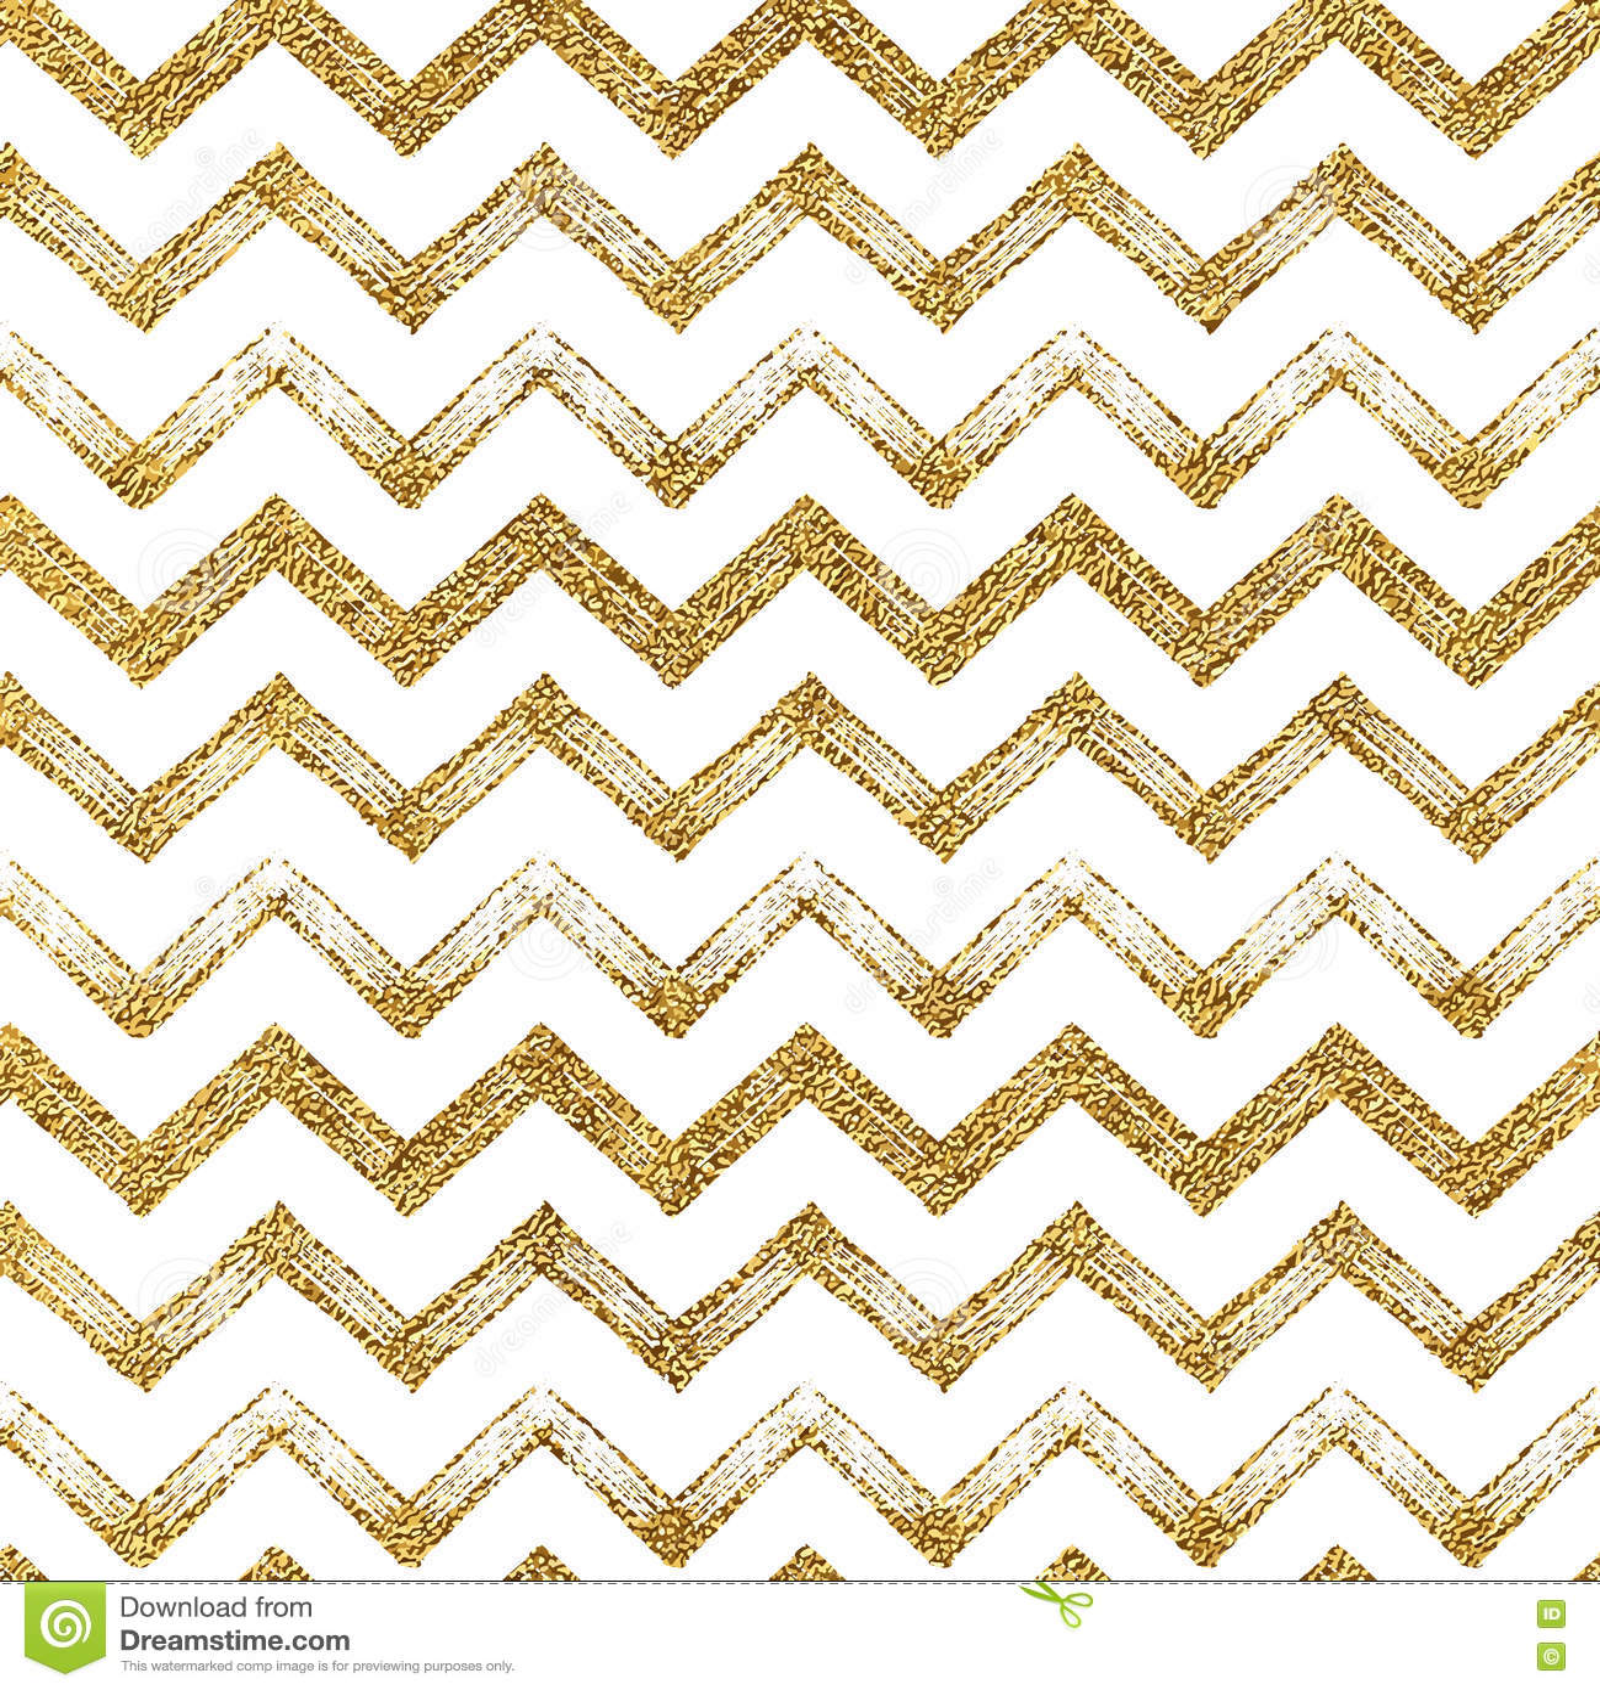 Seamless Pattern Of Gold Glitter Zigzag Chevron Background Golden Zig Zag Stripes Hand Drawn Vector Illustration For Textile Wallpaper Web